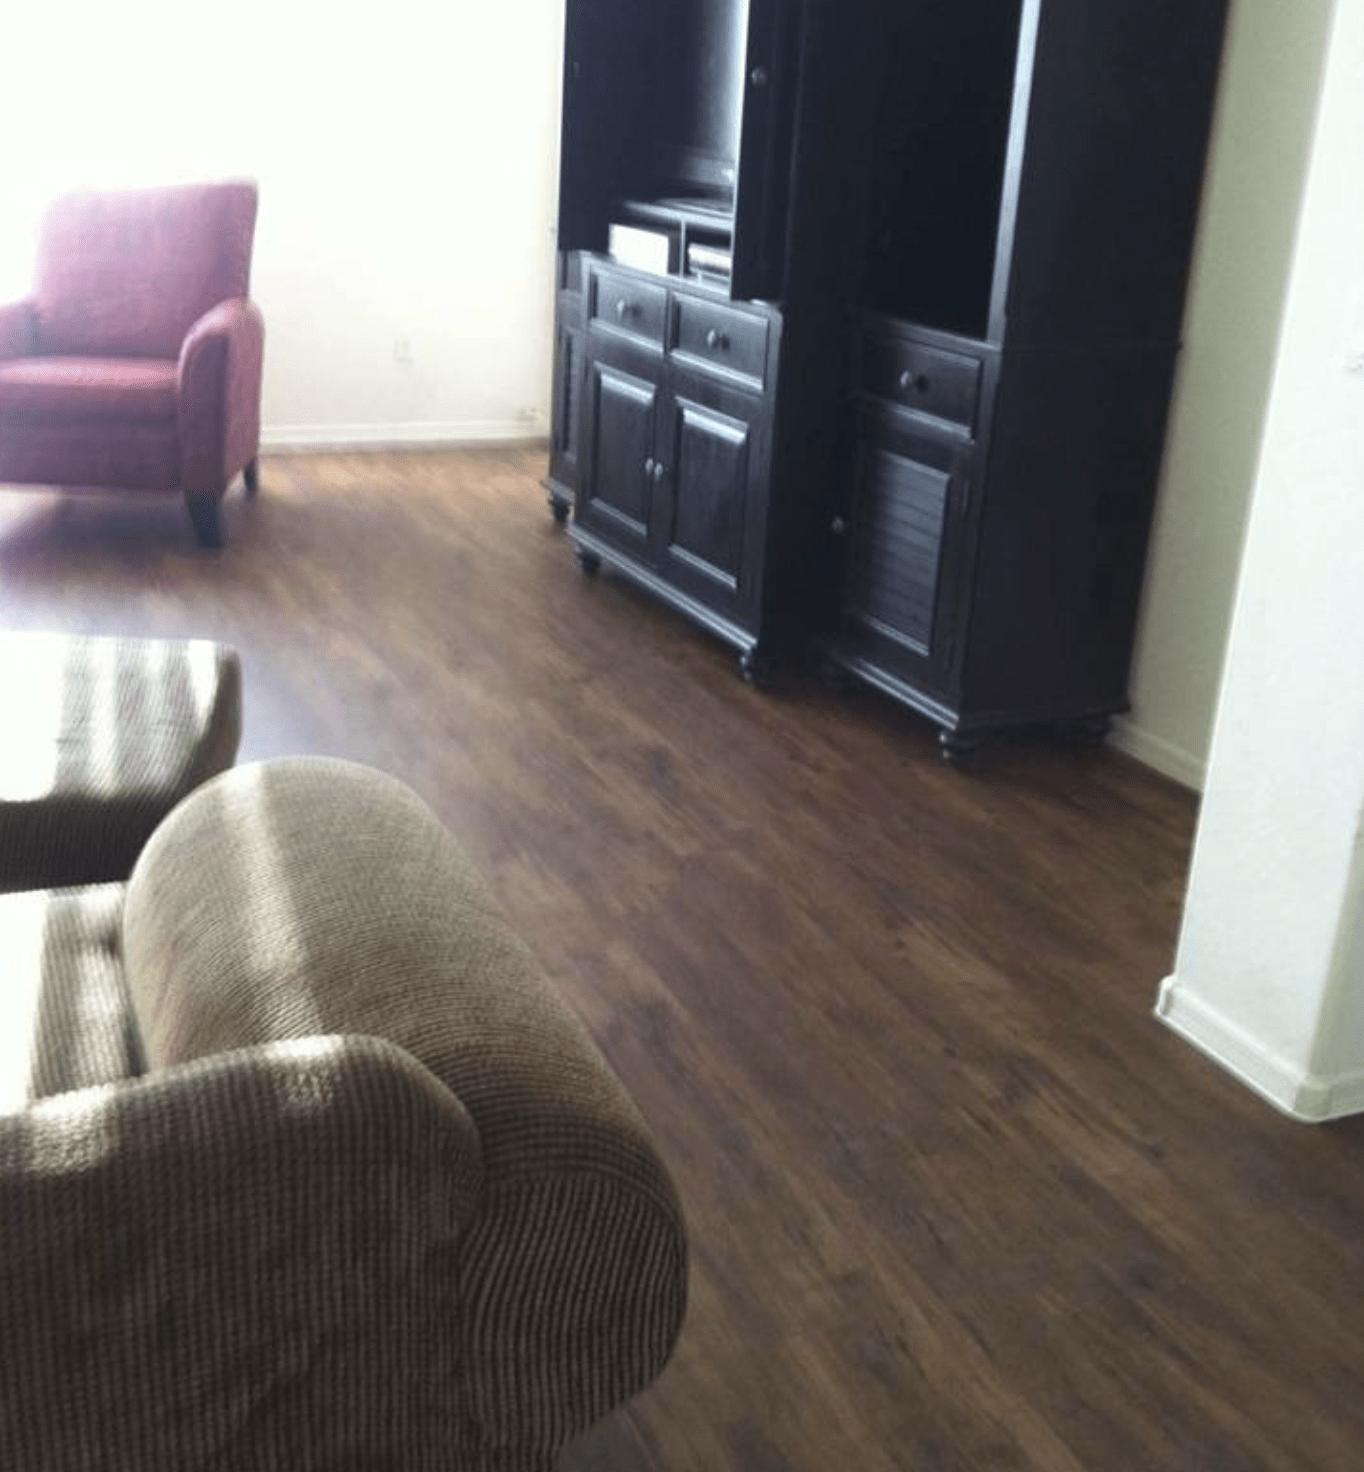 Luxury vinyl plank flooring from Taylors Flooring in Chandler, AZ